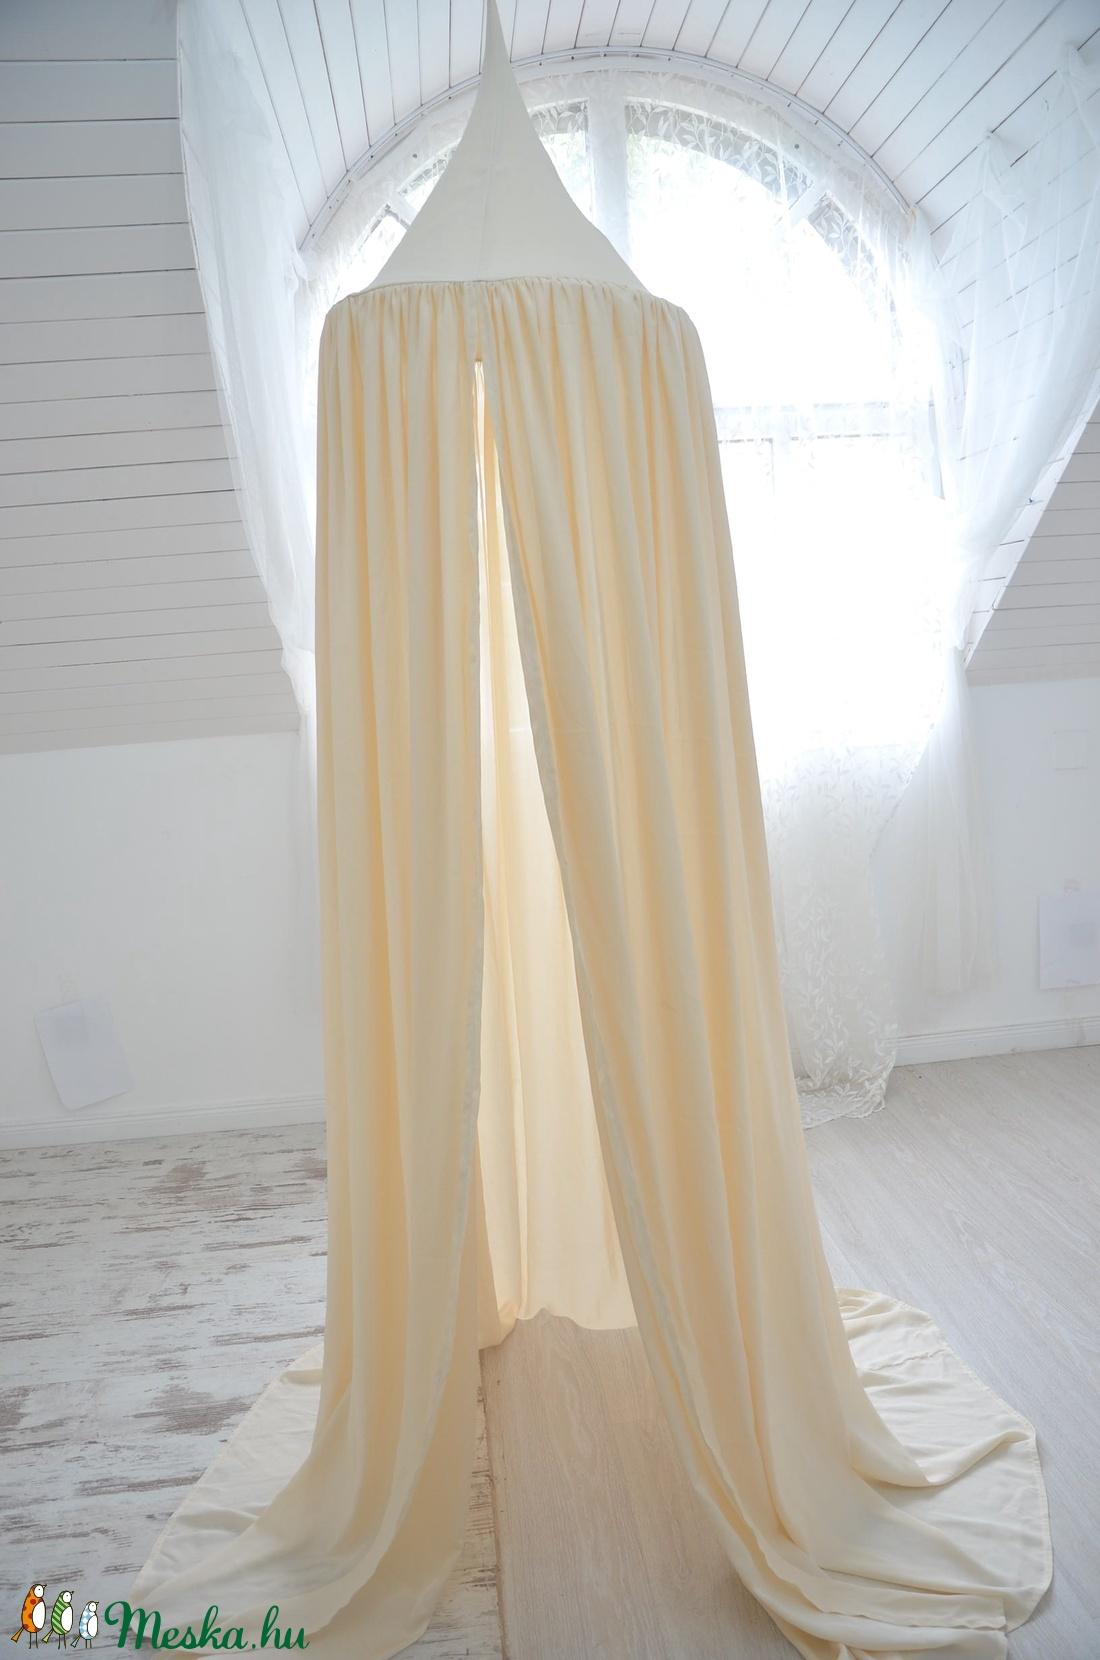 BALDACHIN hercegnőbaldachin - beige (NoaNoa) - Meska.hu ce80cf9aee